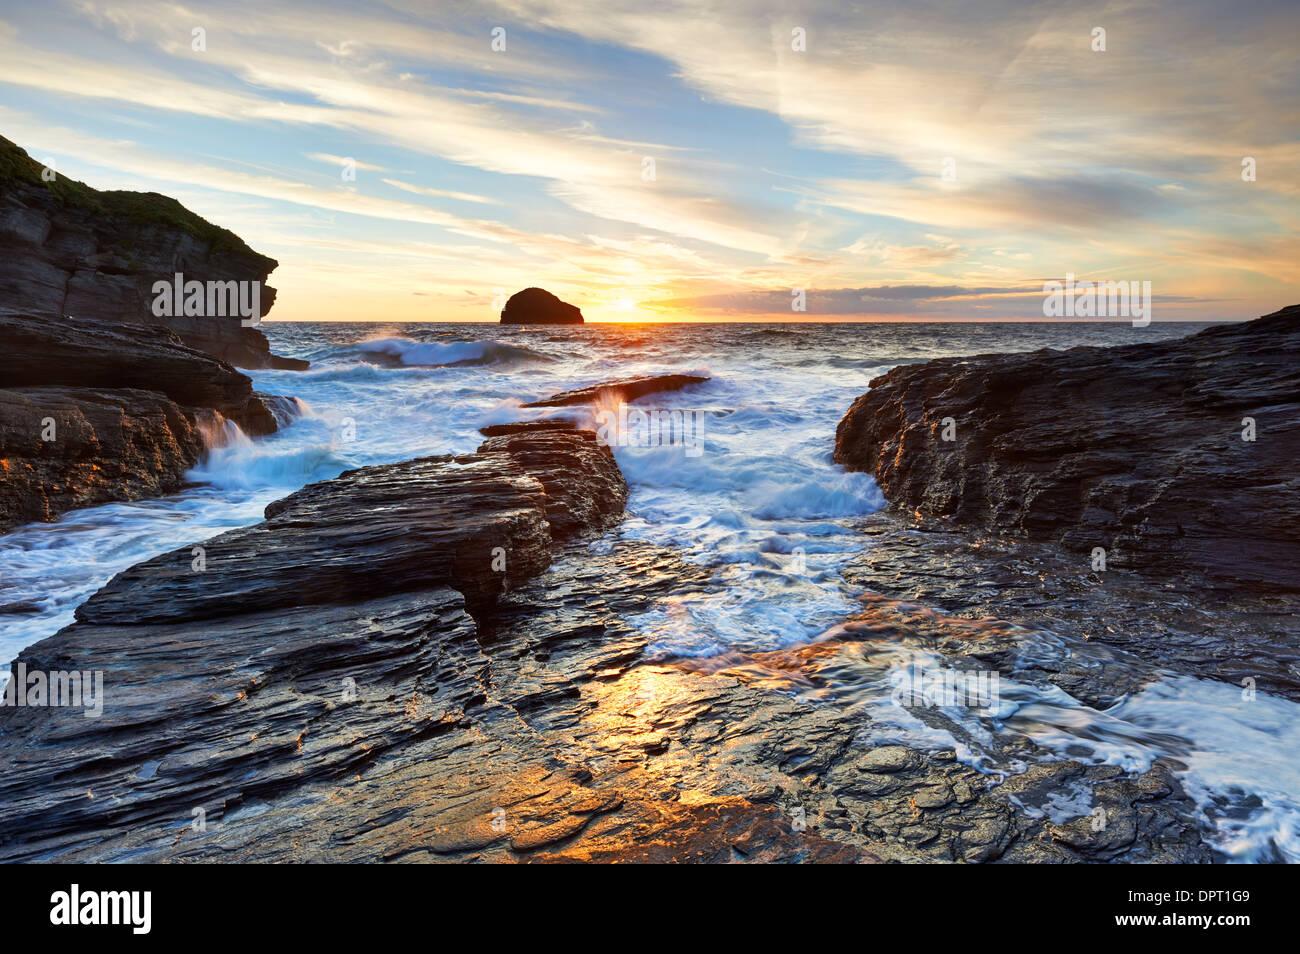 Evening light on the North Cornish Coast at Trebarwith Strand. - Stock Image